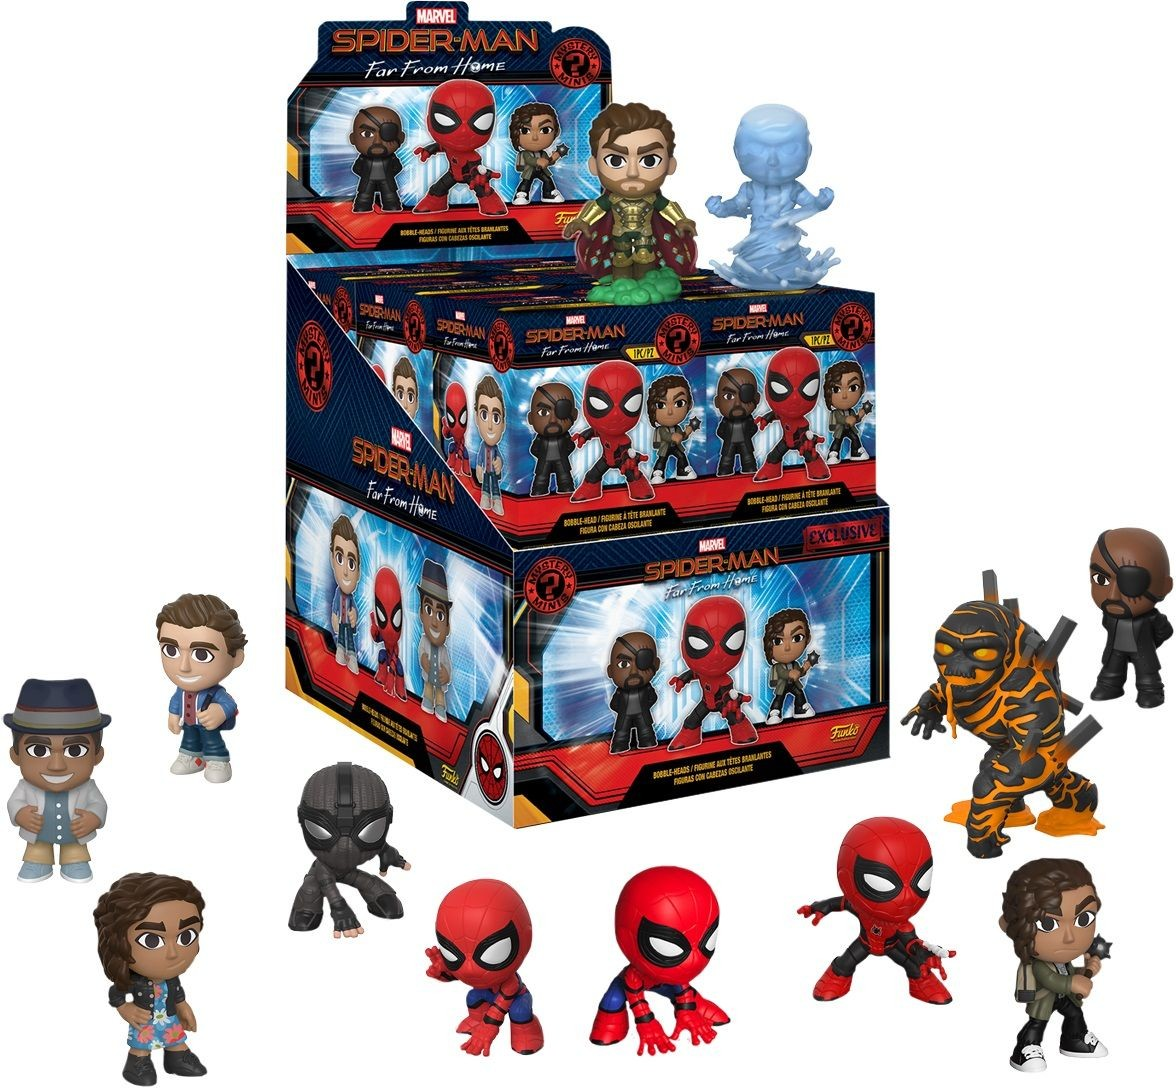 Фигурка Funko Mystery Minis: Слепой выбор 1/12 Человек-паук: Вдали от дома (Spider-Man: Far From Home) (12PC PDQ (Exc2)) (39353) 4 см